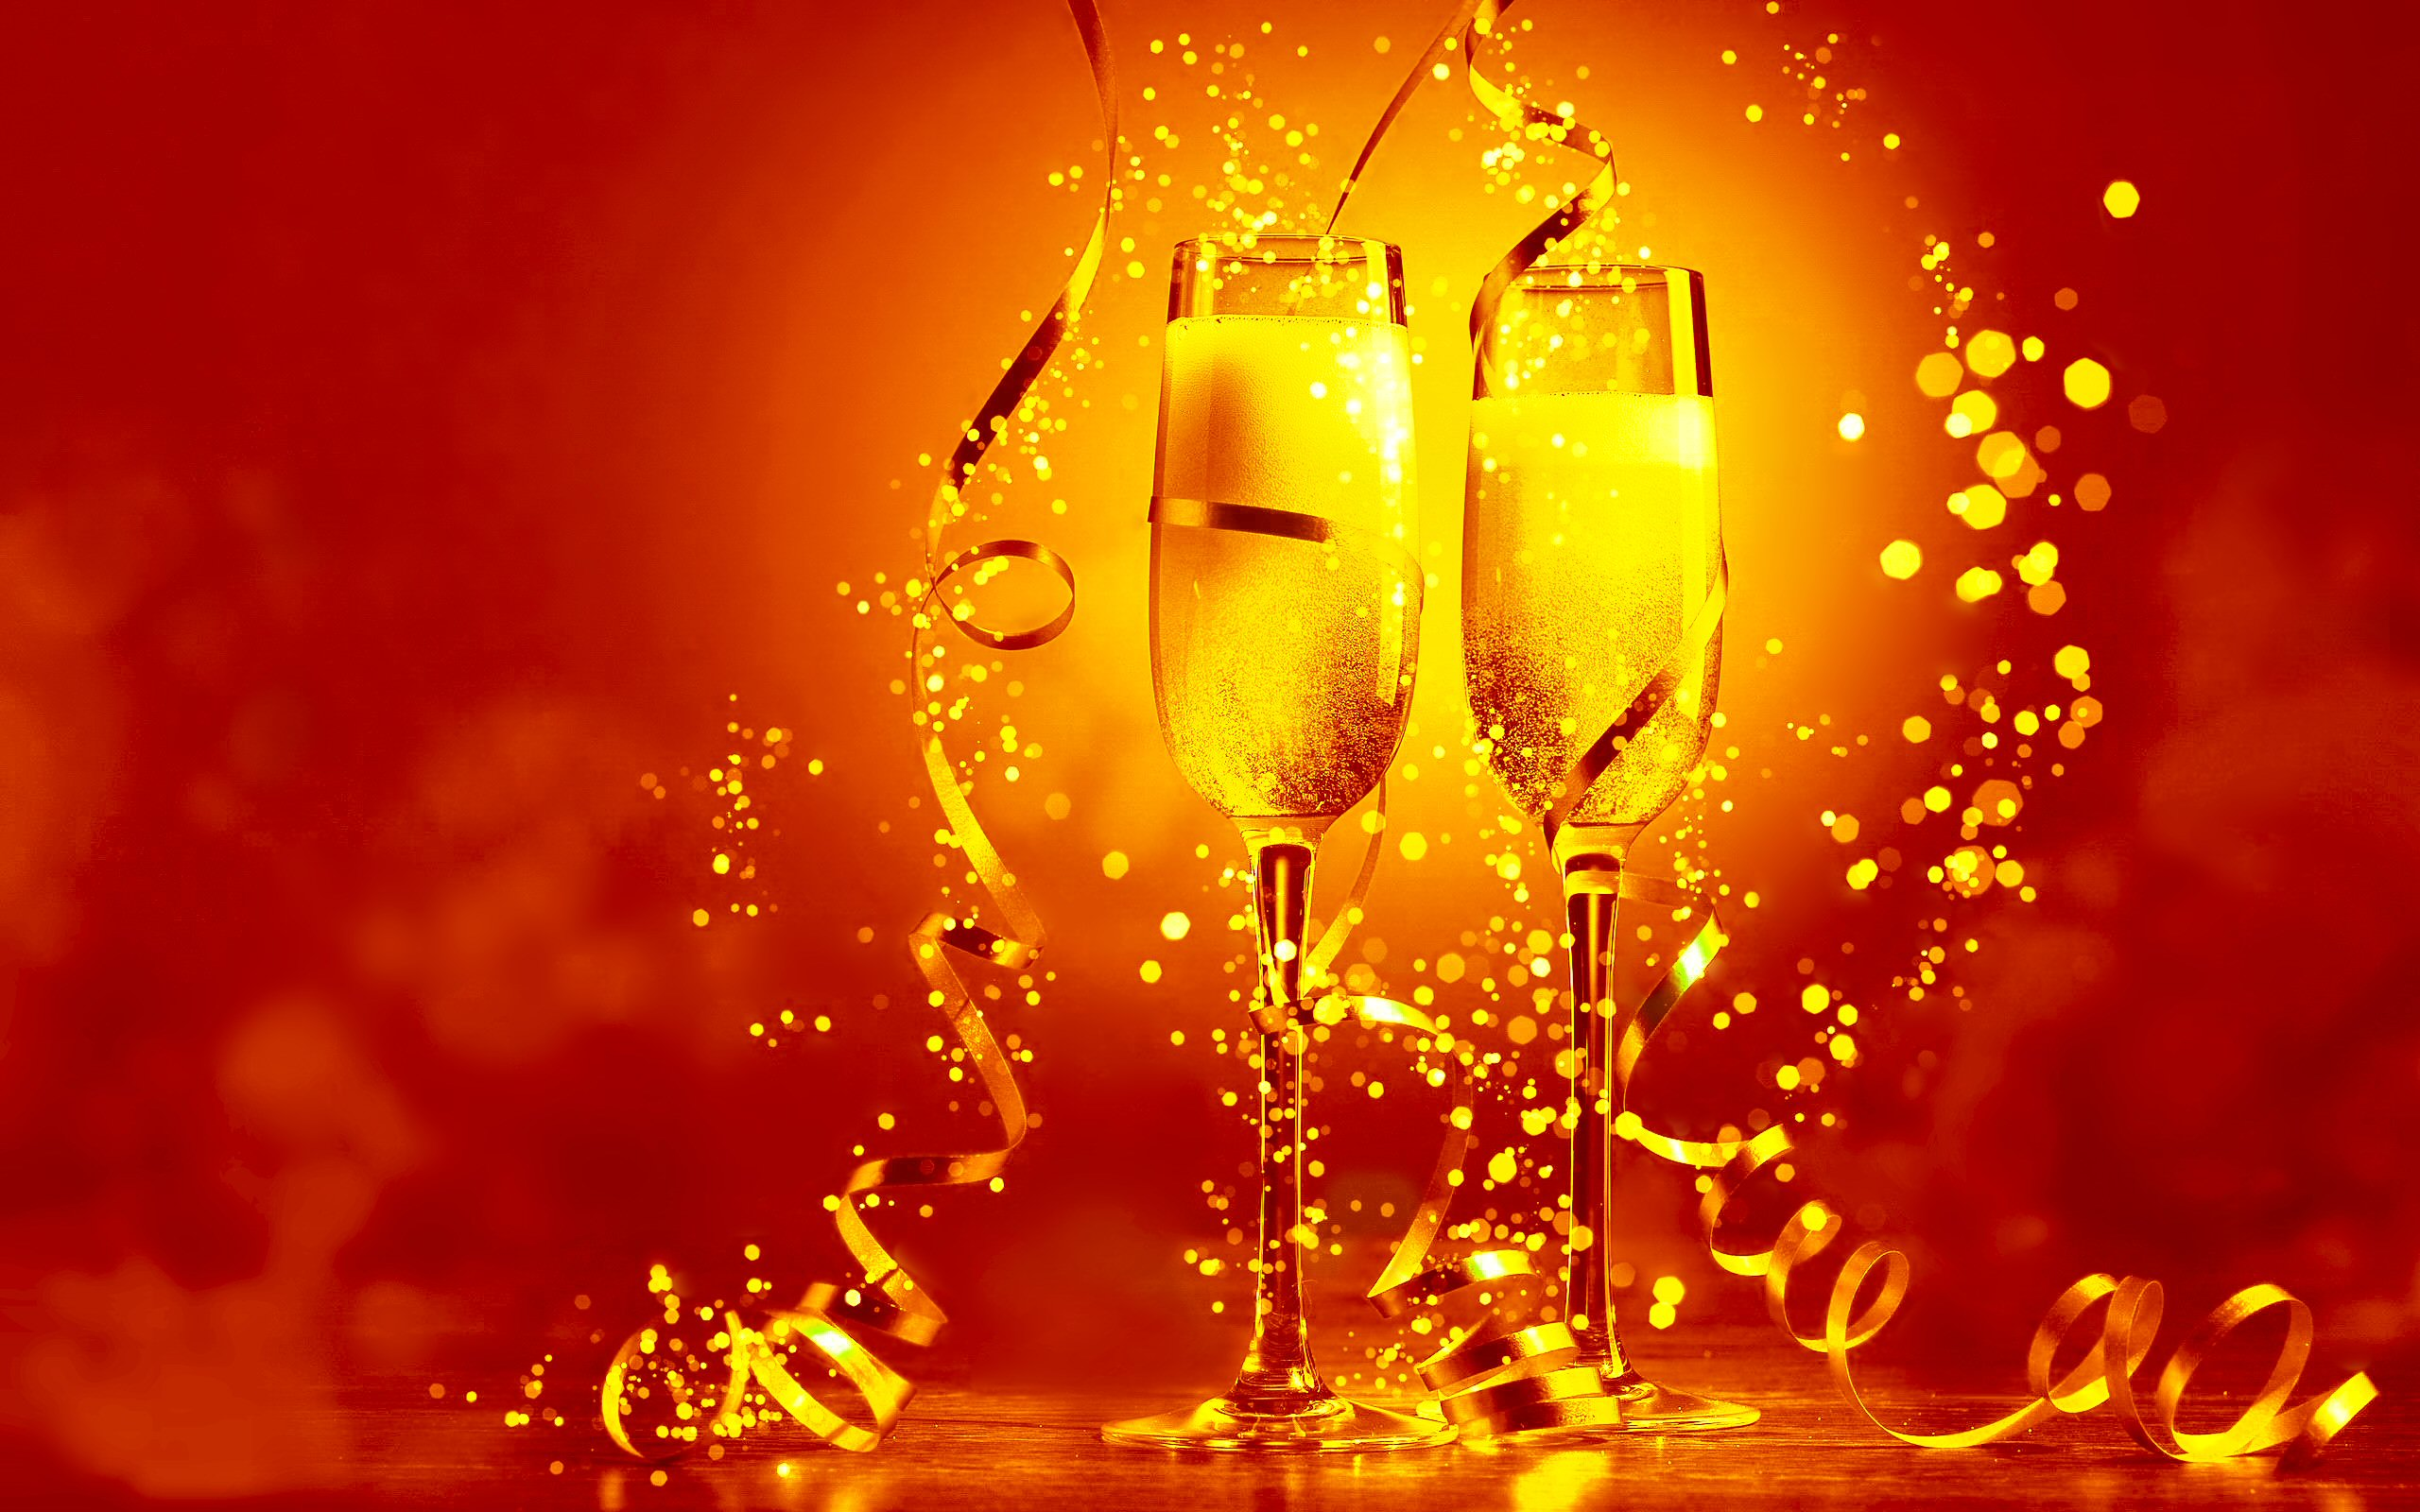 New Years Eve Wallpaper 2015 - WallpaperSafari  New Years Eve W...